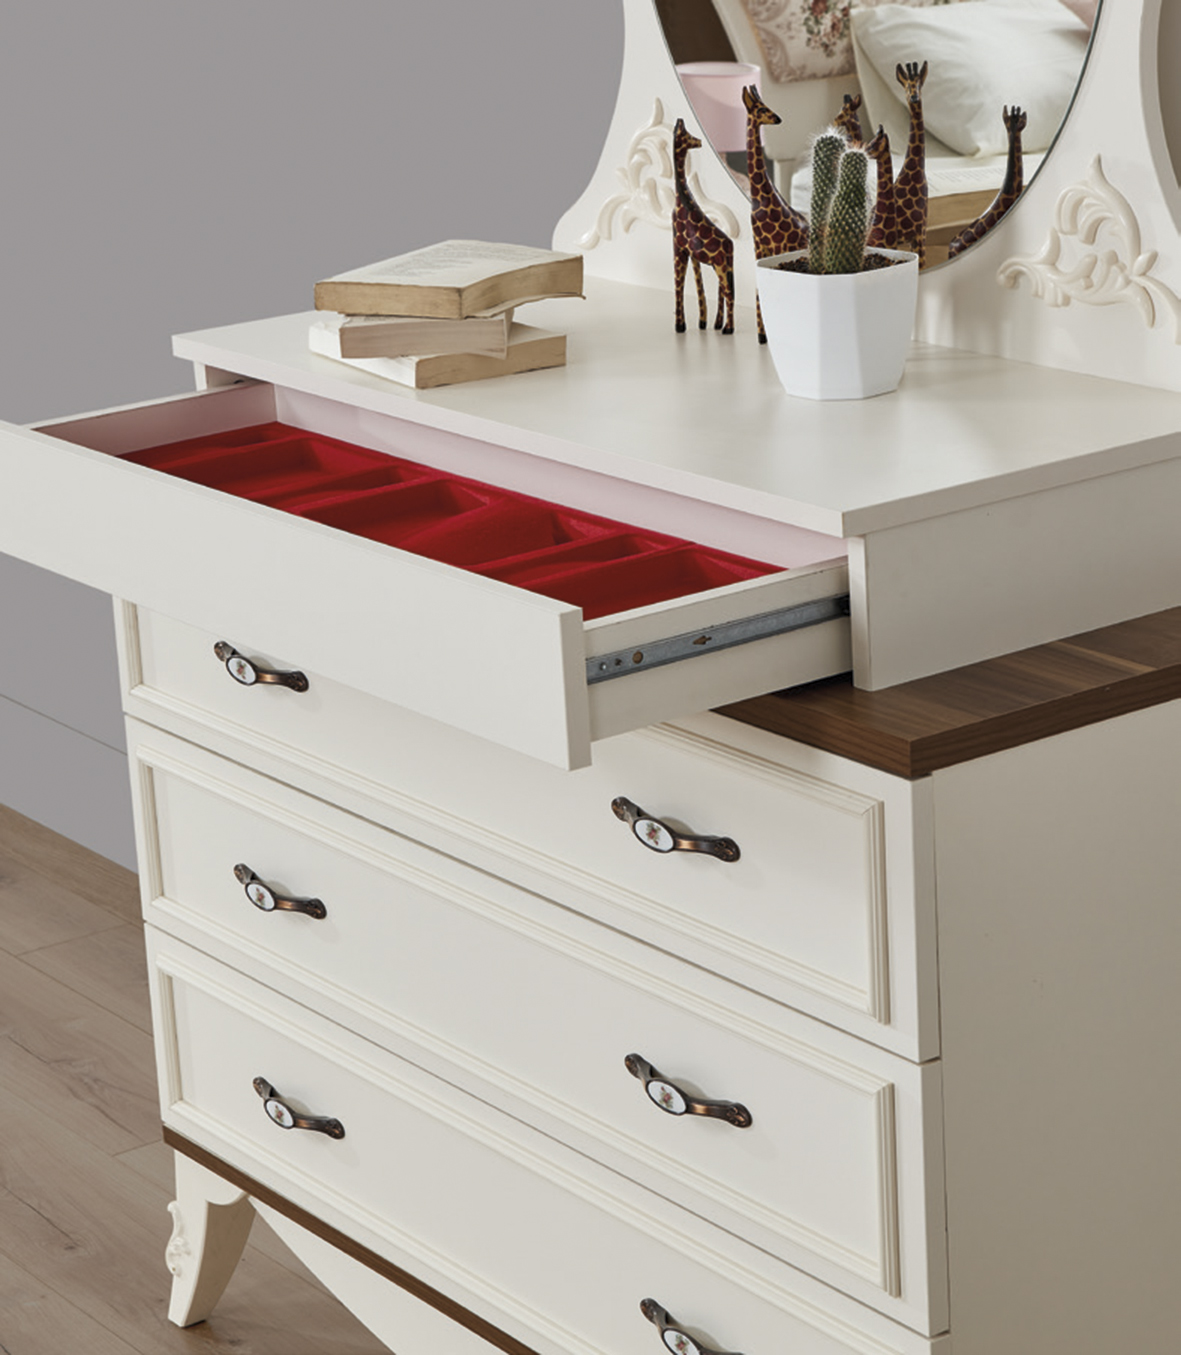 Roma Country Bedroom Set Buy Bedroom Set Bedroom Set 2020 Modern Bedroom Set Product On Alibaba Com